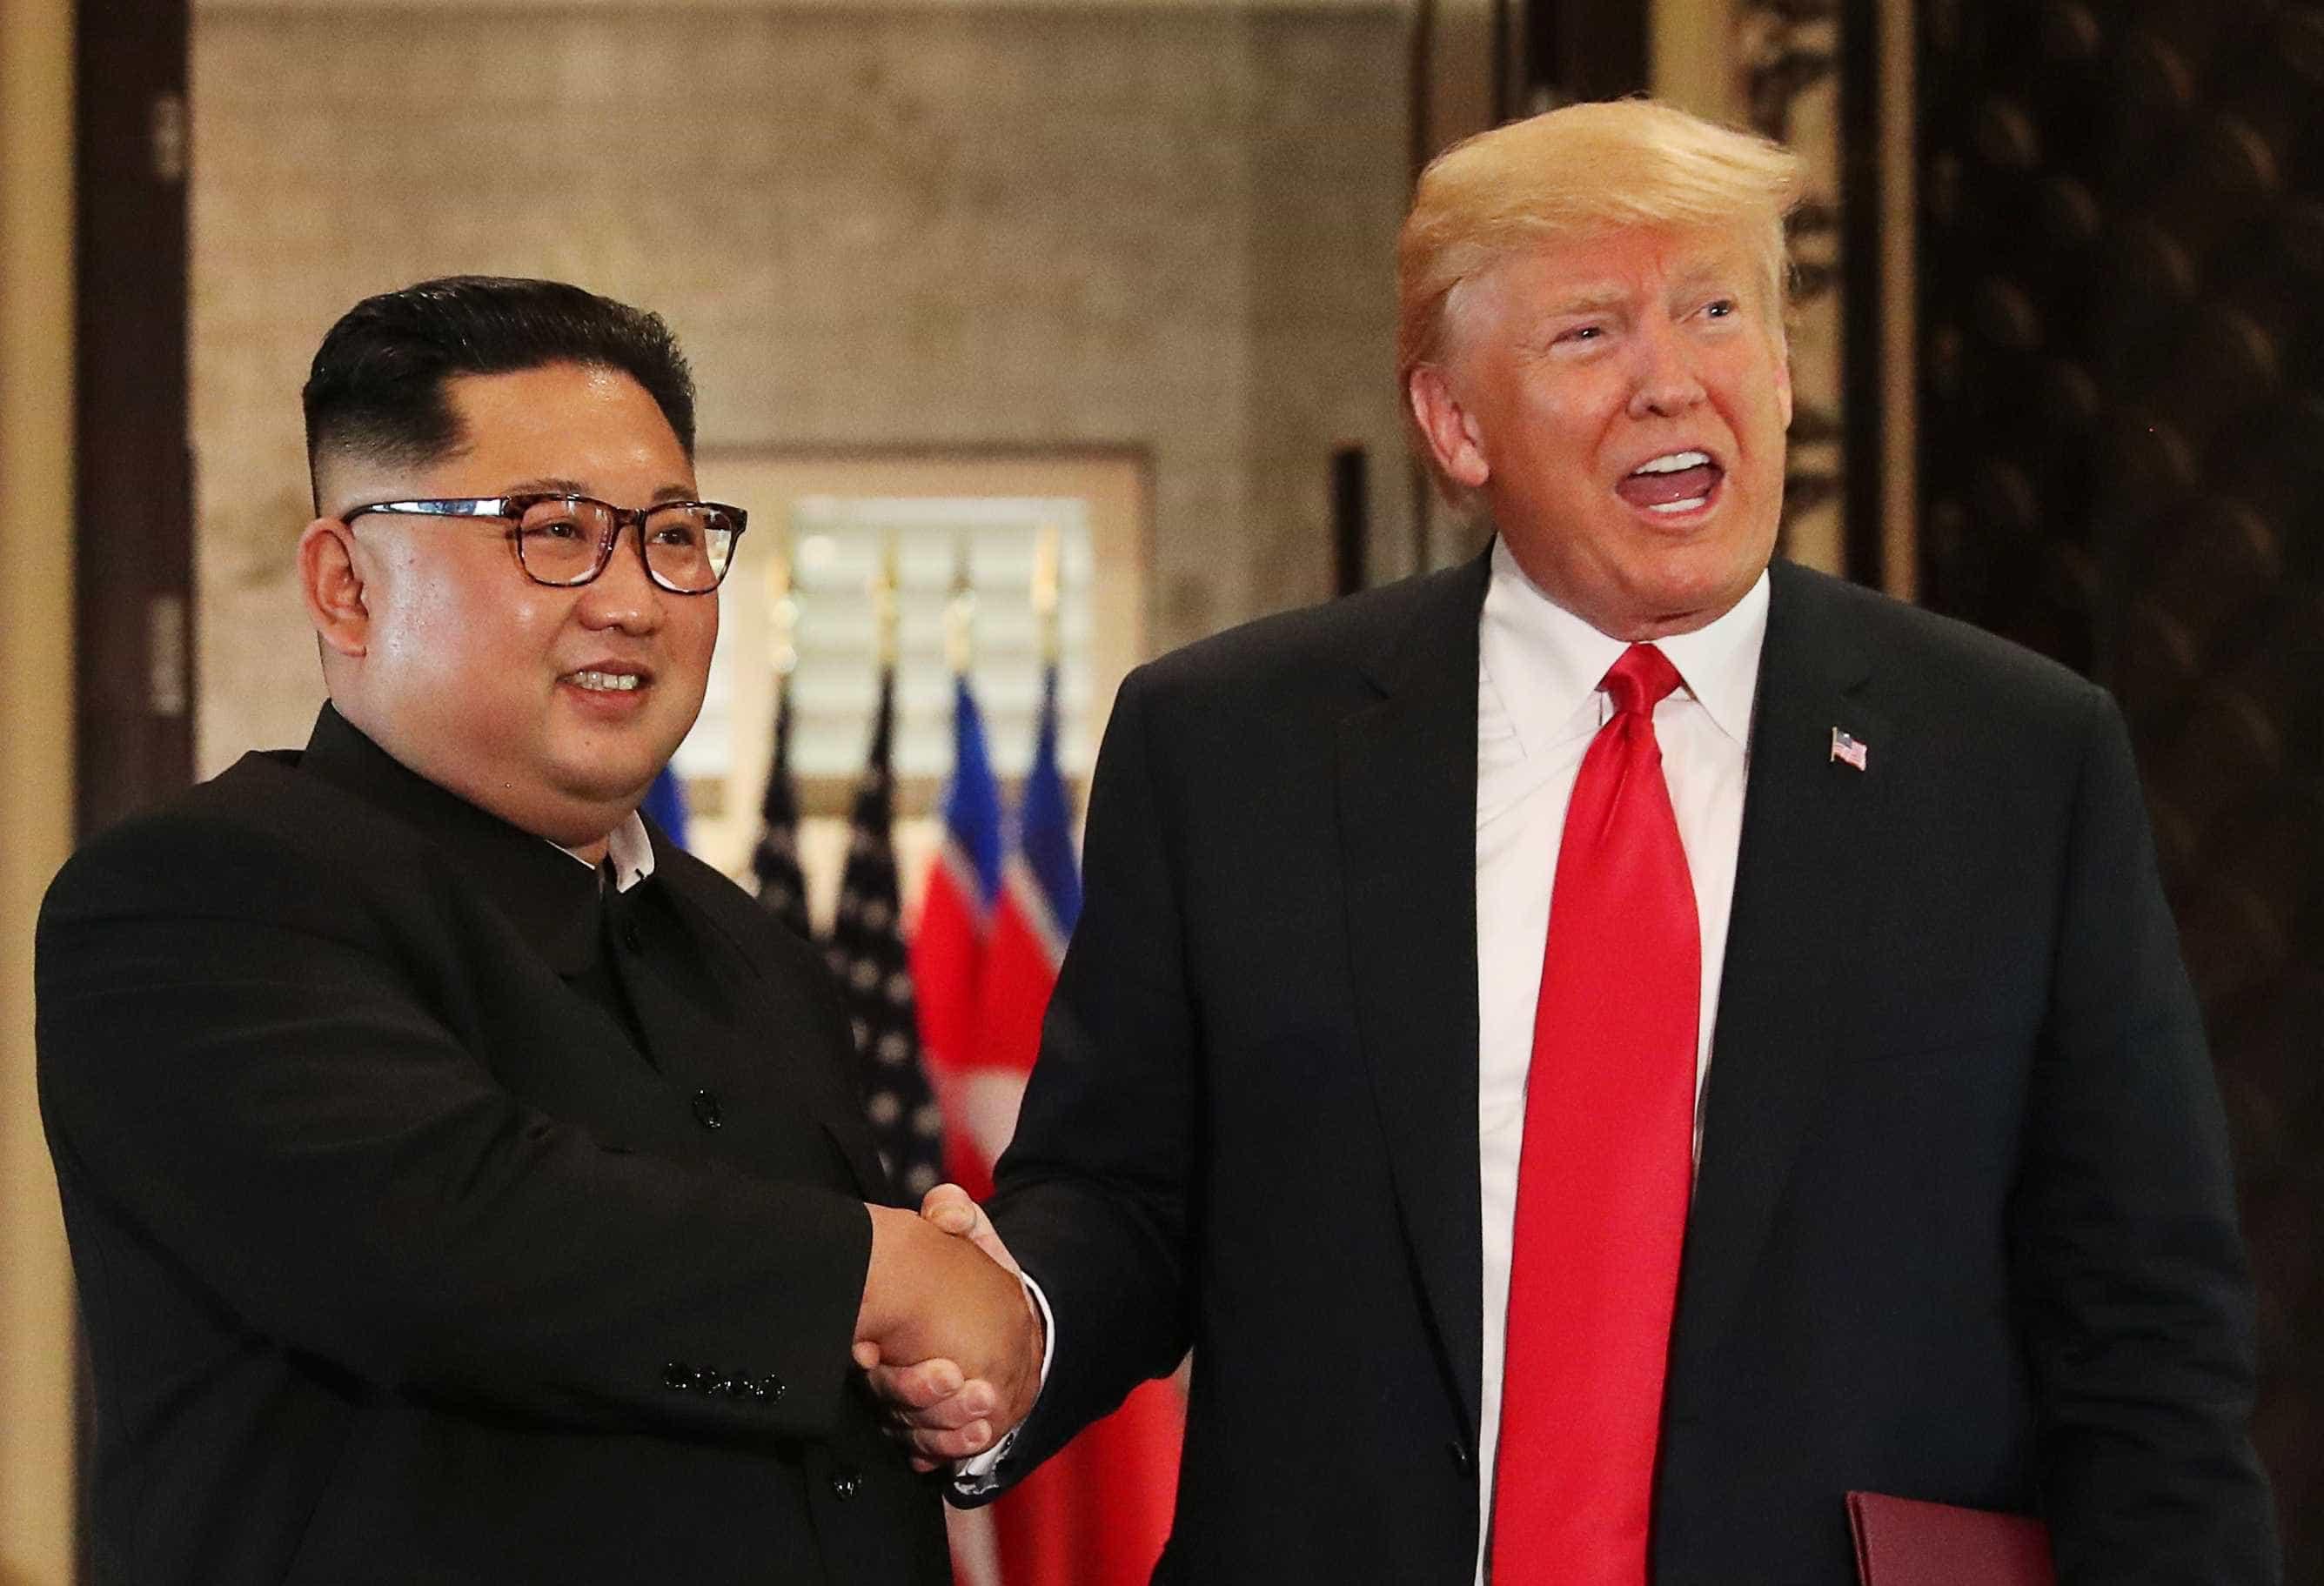 Trump confirma segundo encontro com Kim Jong-un no Vietnã